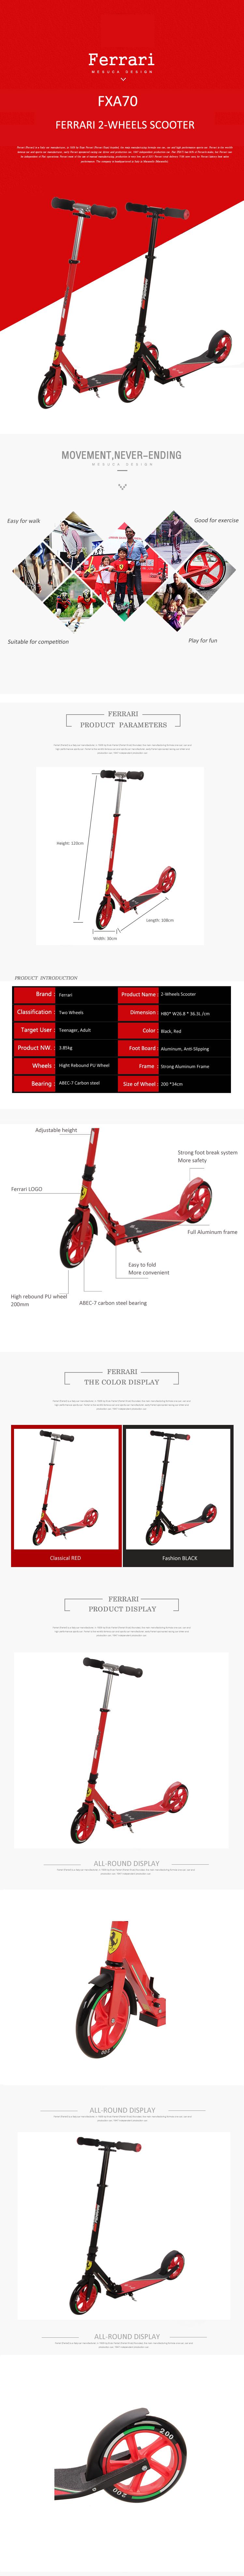 Details about Adult Kick Scooter Outdoor Bike Aluminum Foldable 2 Big PU  Wheels 200mm Black